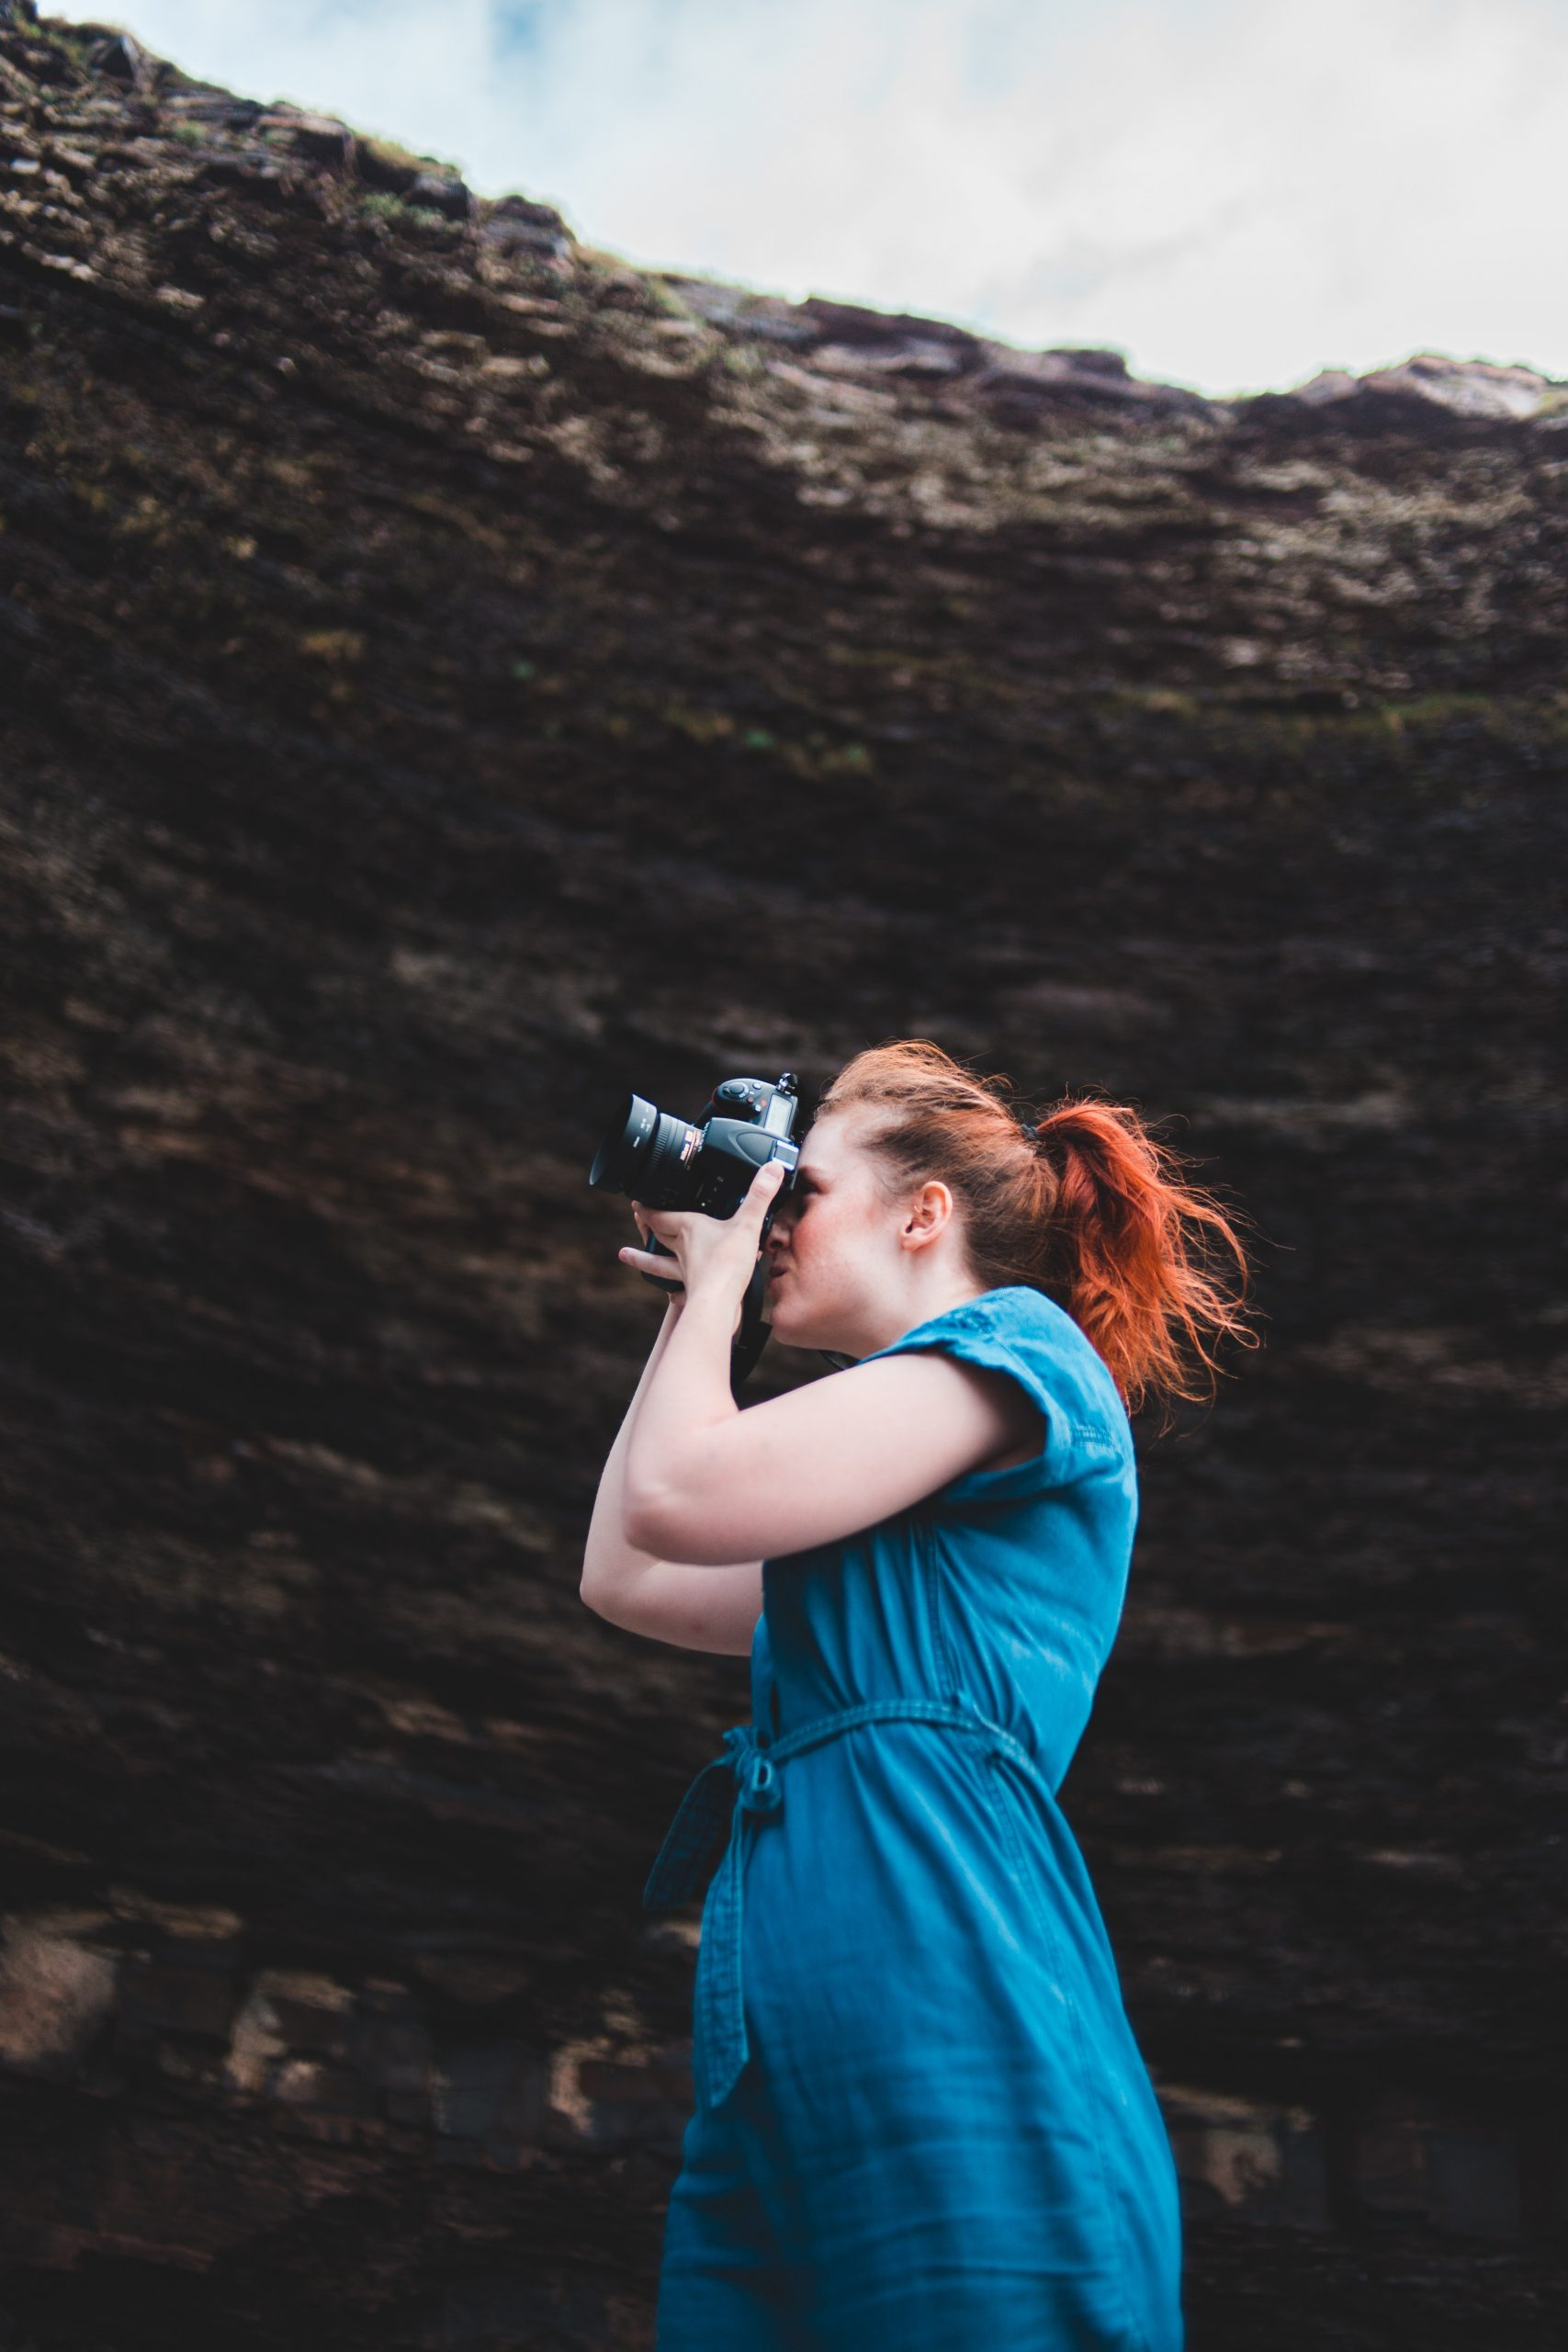 Photographer practicing skills